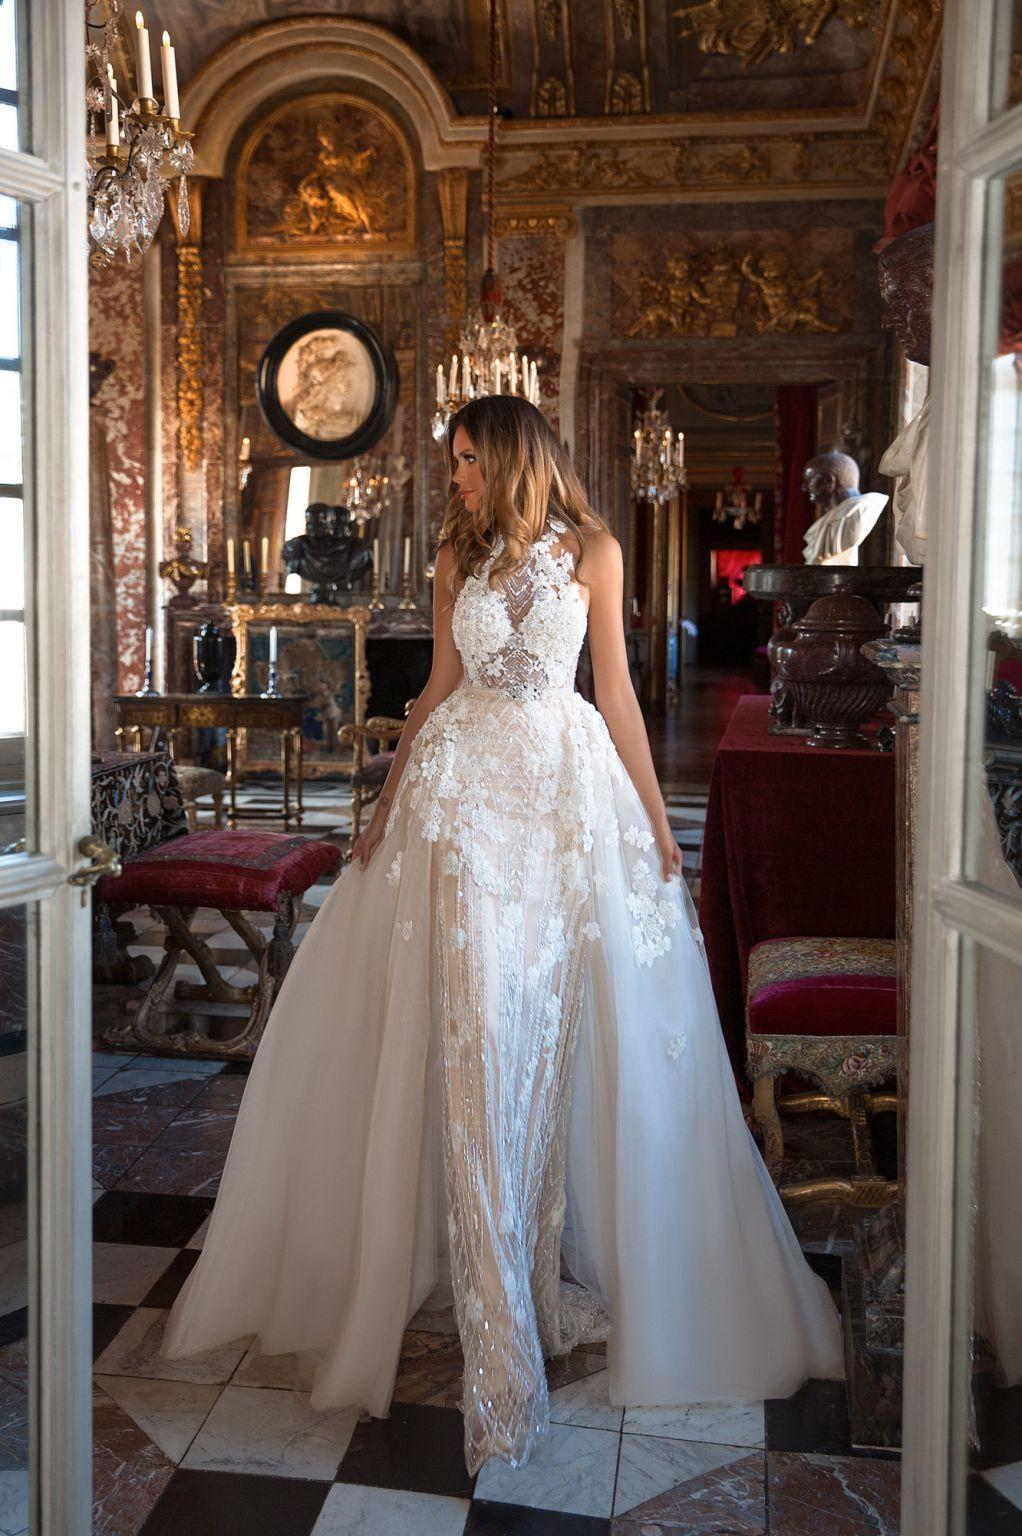 Milla Nova Ramiata 2 700 Size 8 Used Wedding Dresses Strapless Wedding Gown Wedding Dresses Wedding Dresses Lace